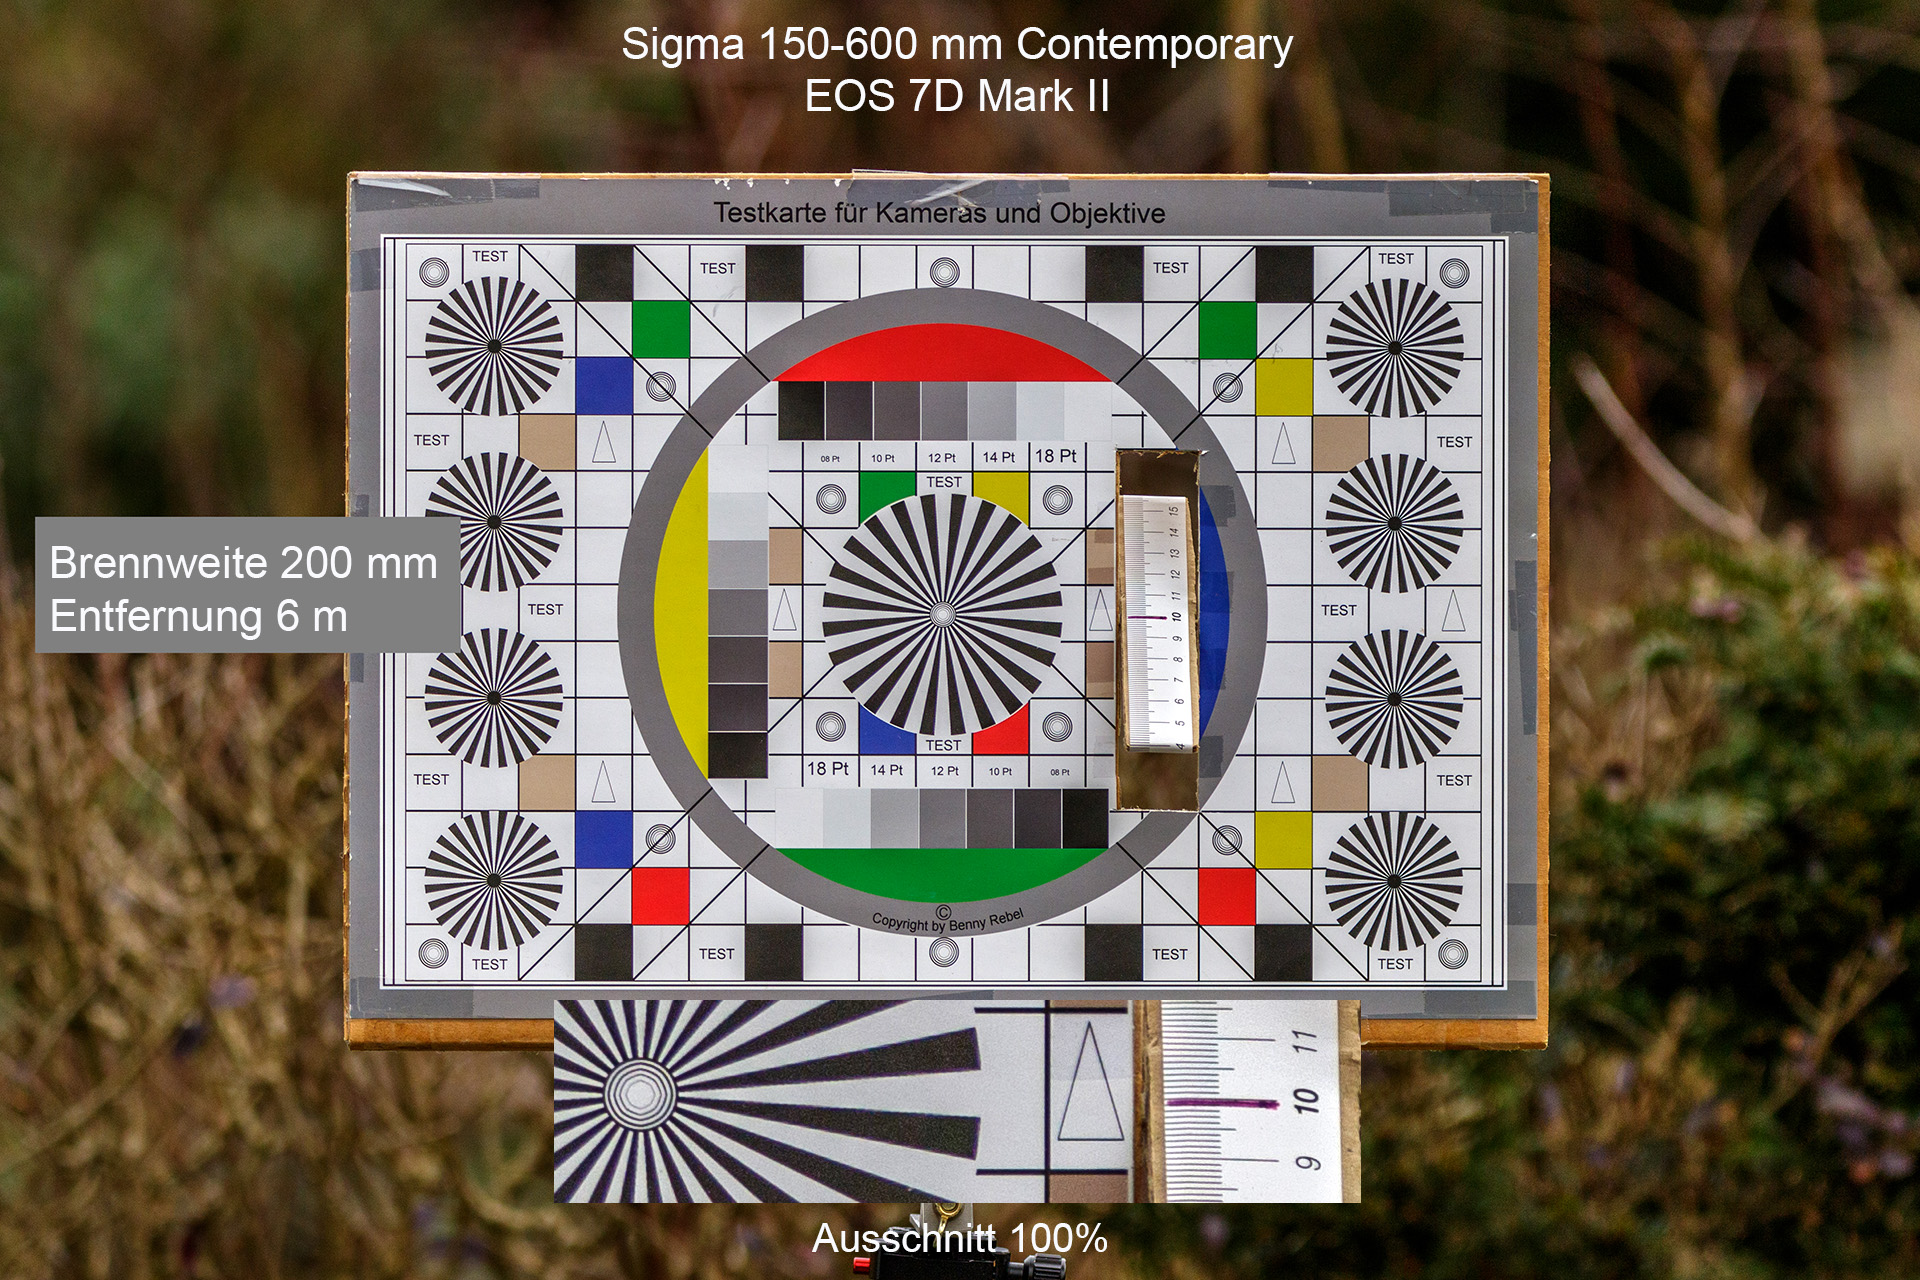 Testaufnahmen, Sigma 150-600 mm, 7D Mark II, 6 Meter, 200 mm